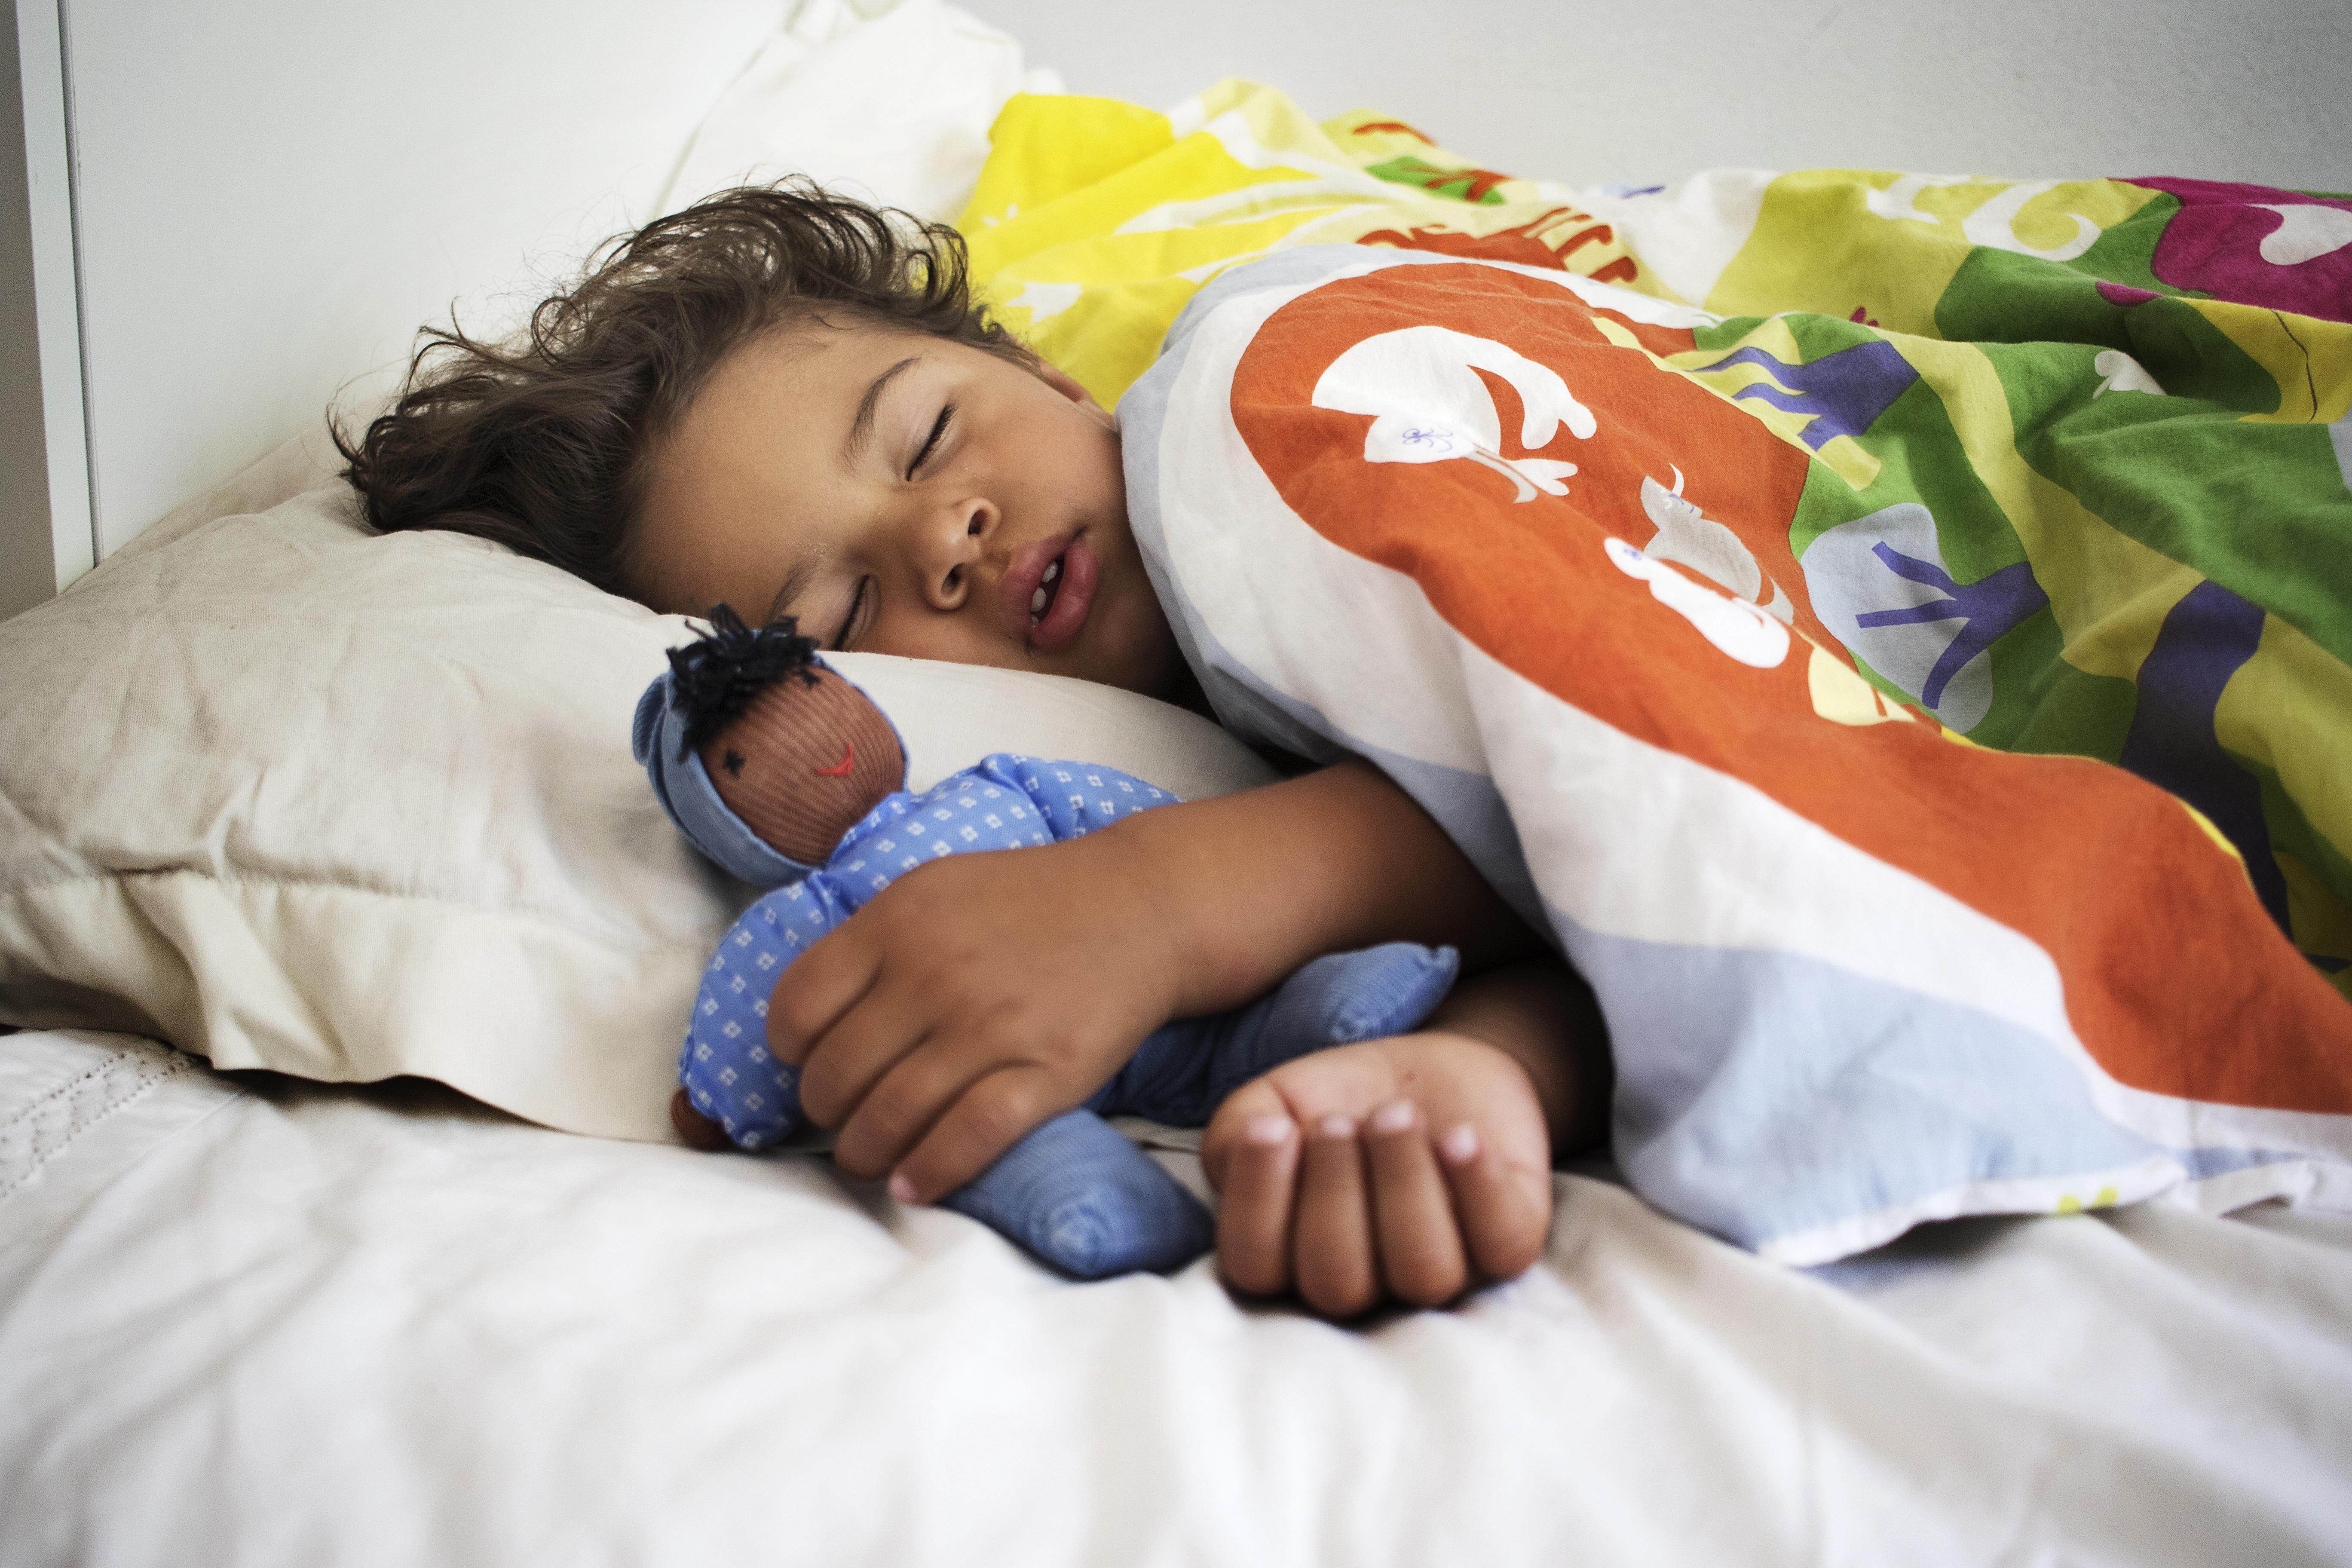 sömnproblem gravid tidigt